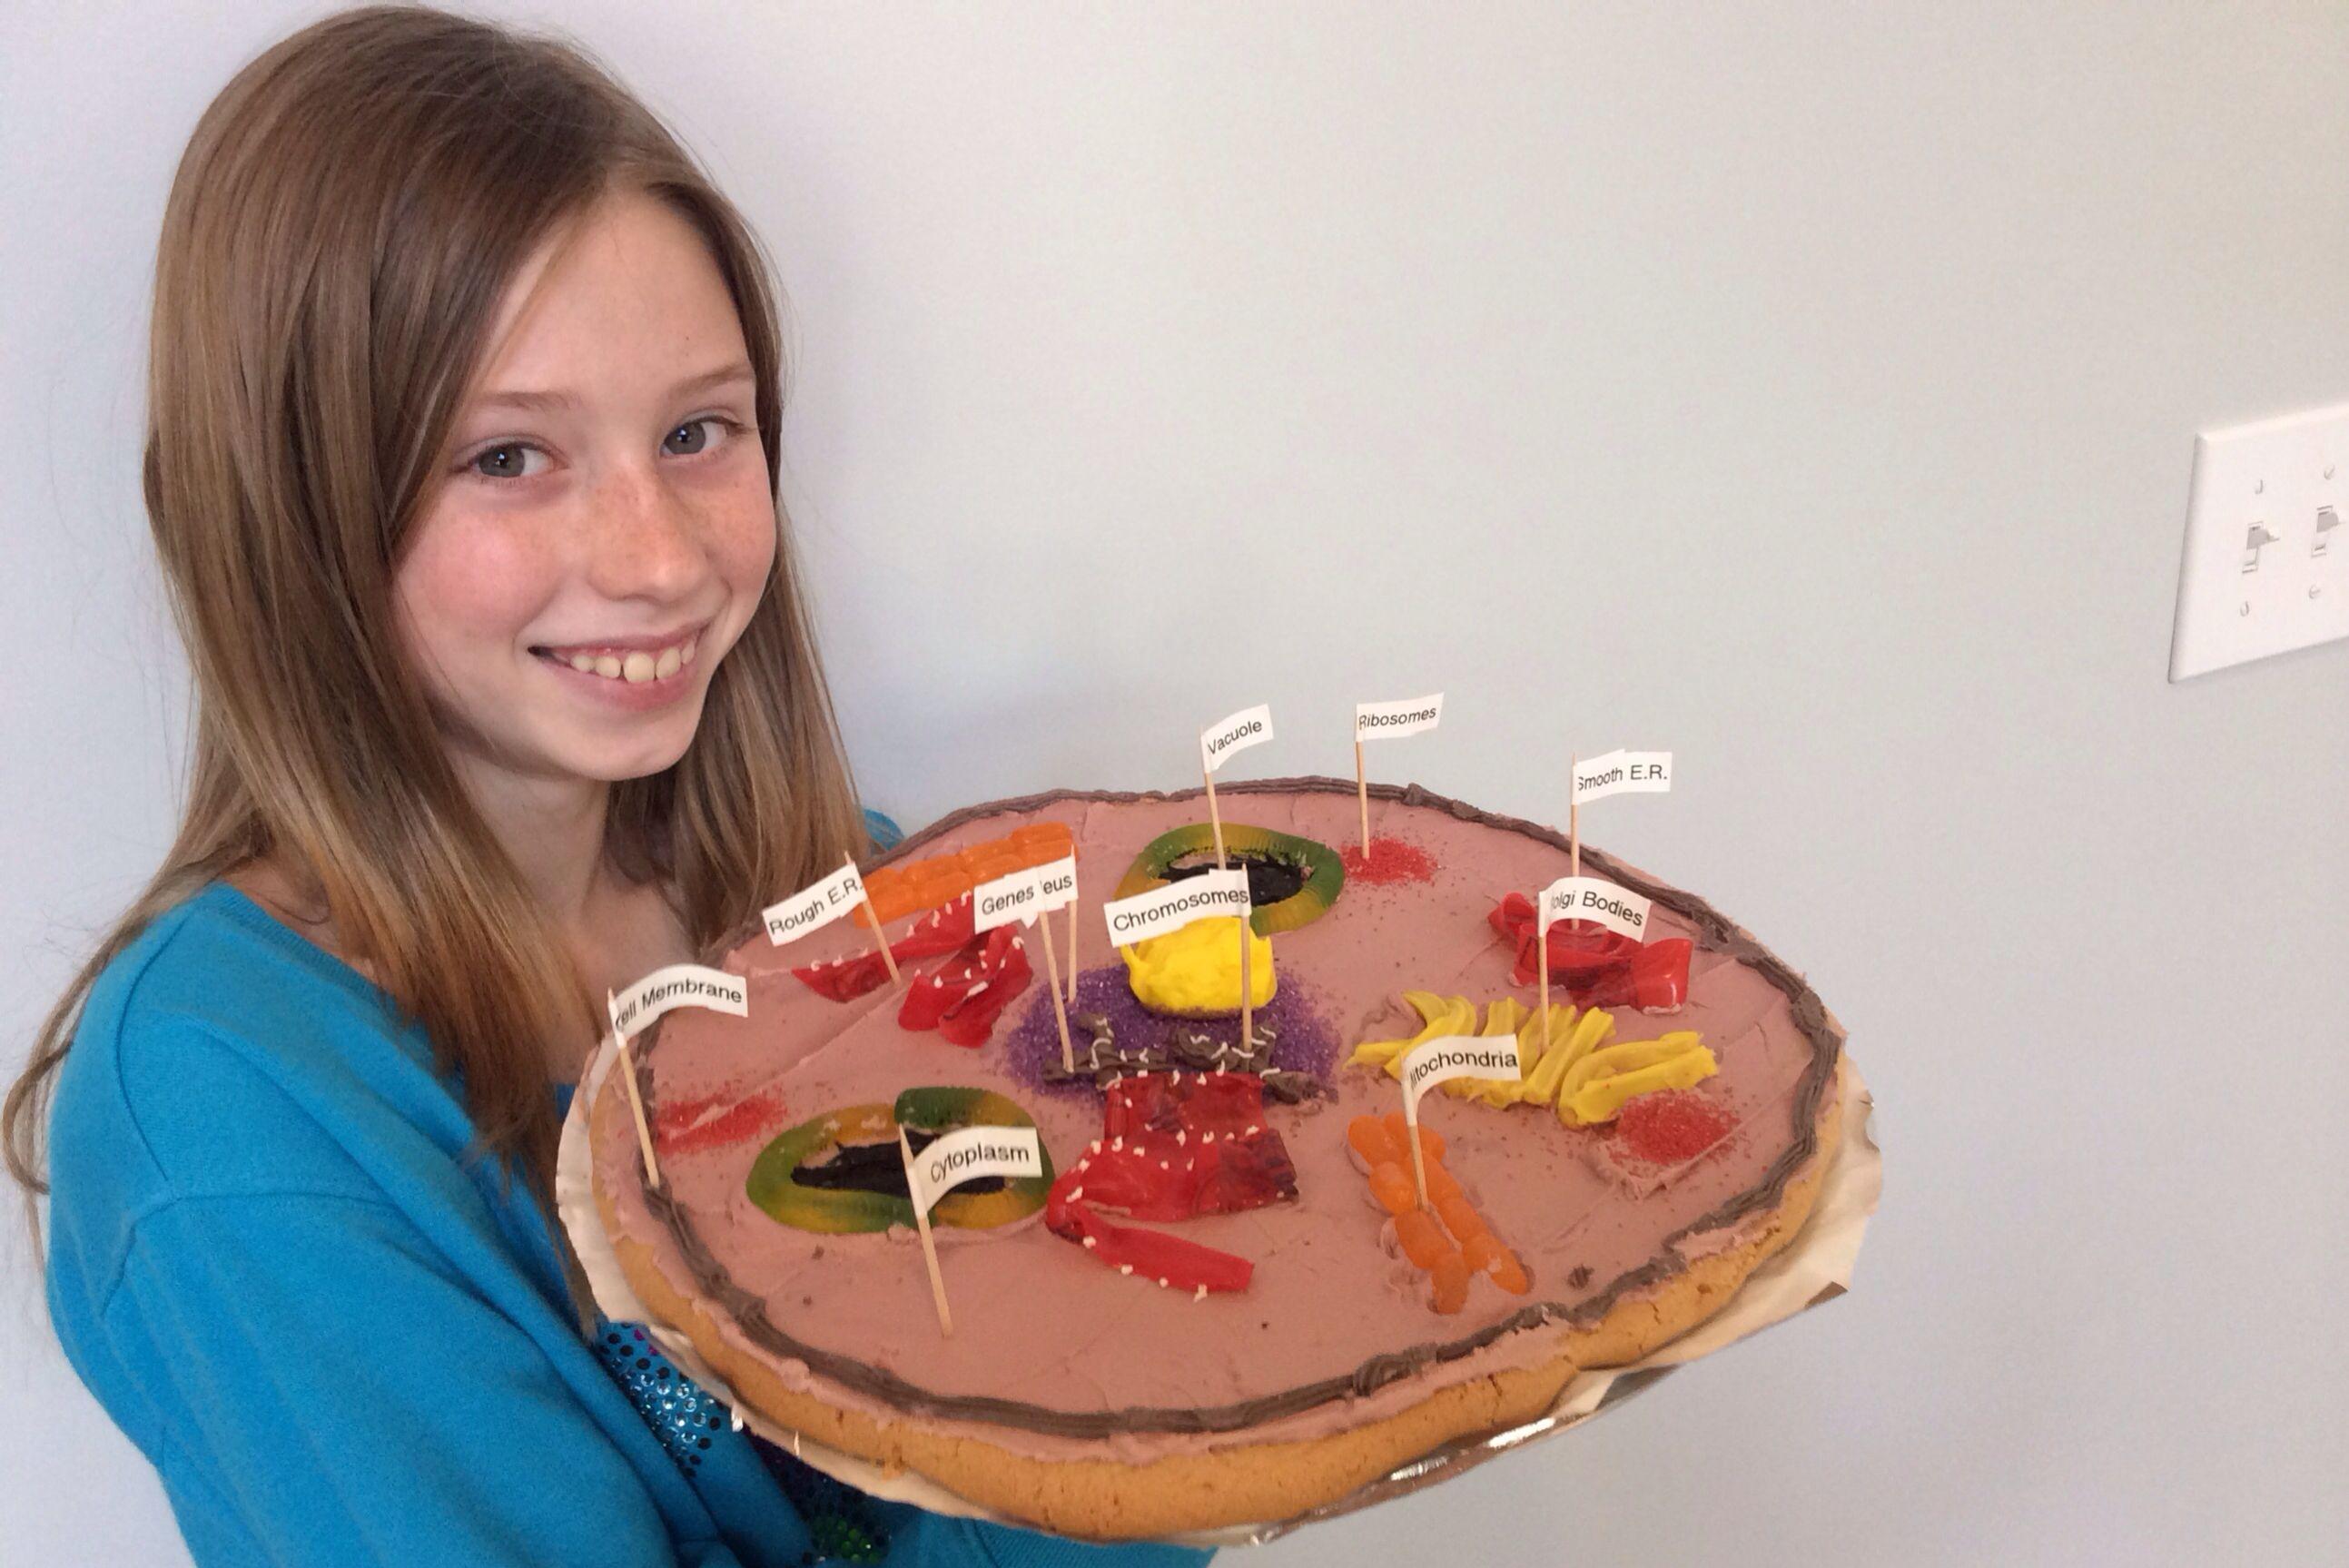 Animal Cell Model Edible